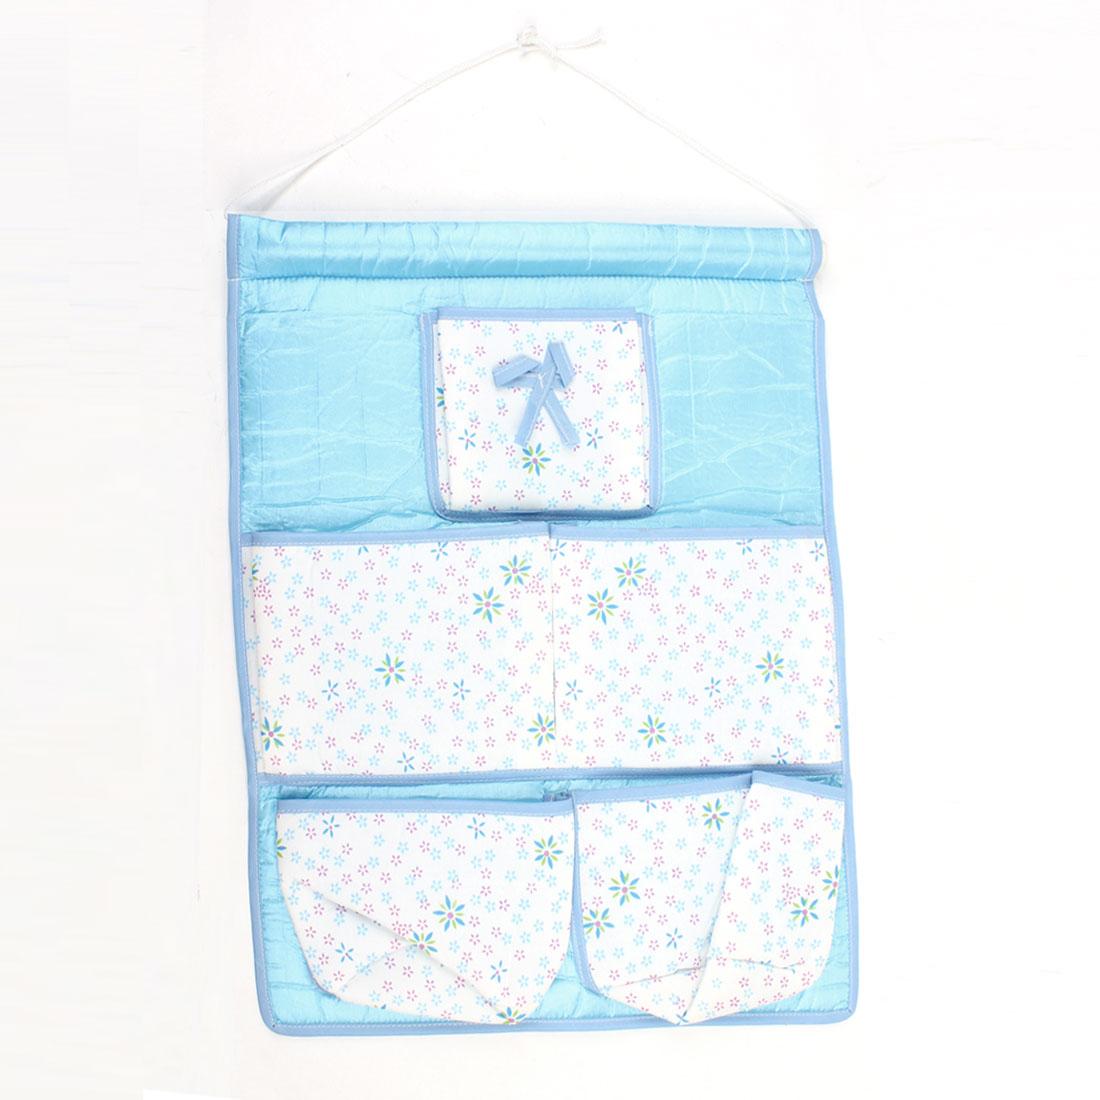 Bowknot Flower Decor 5 Pockets Wall Hanging Organizer Blue Bag